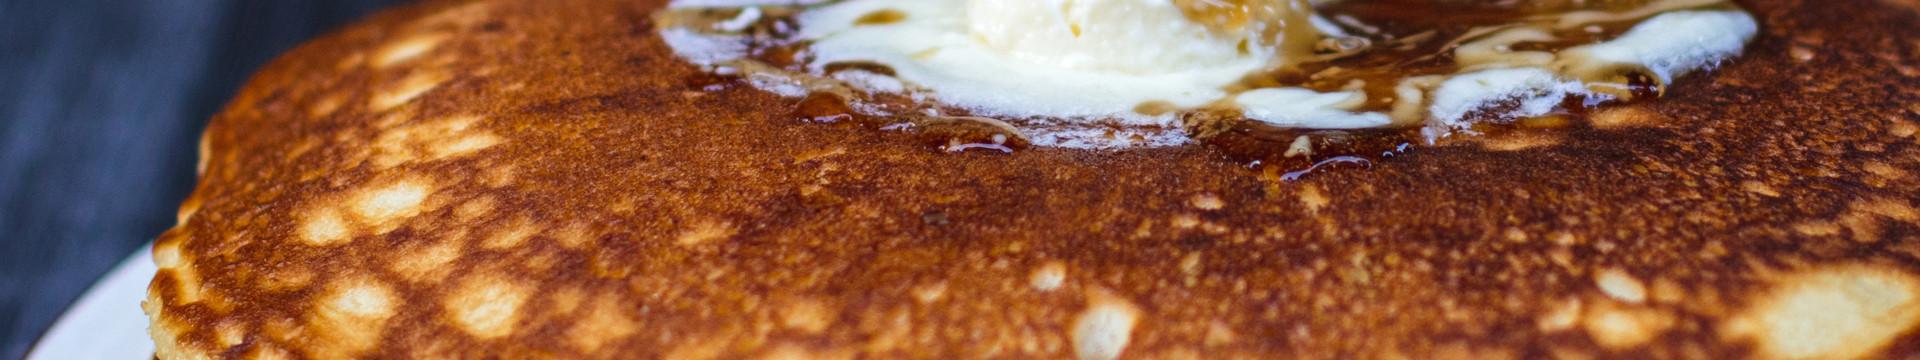 Wild Bear Inn Free Breakfast |  Pancakes